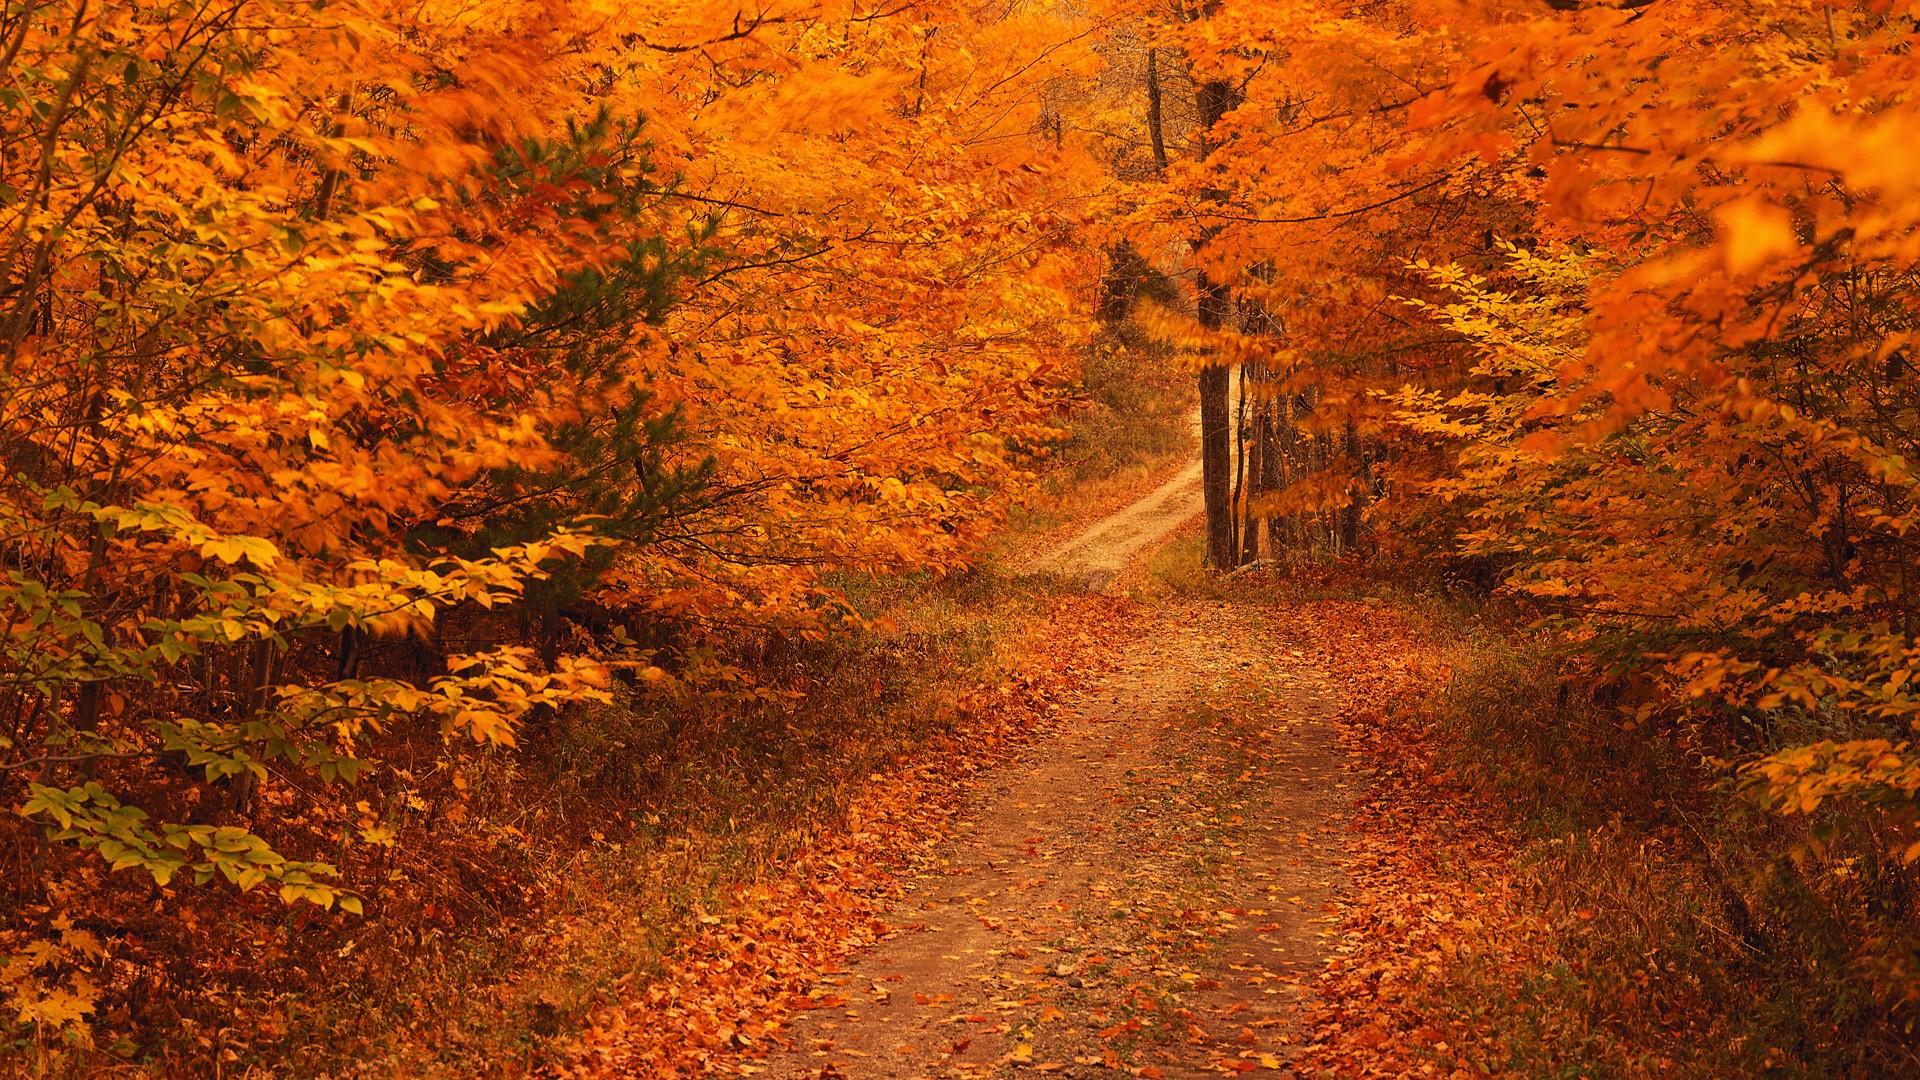 Fall Season Desktop Backgrounds Desktop Image 1920x1080